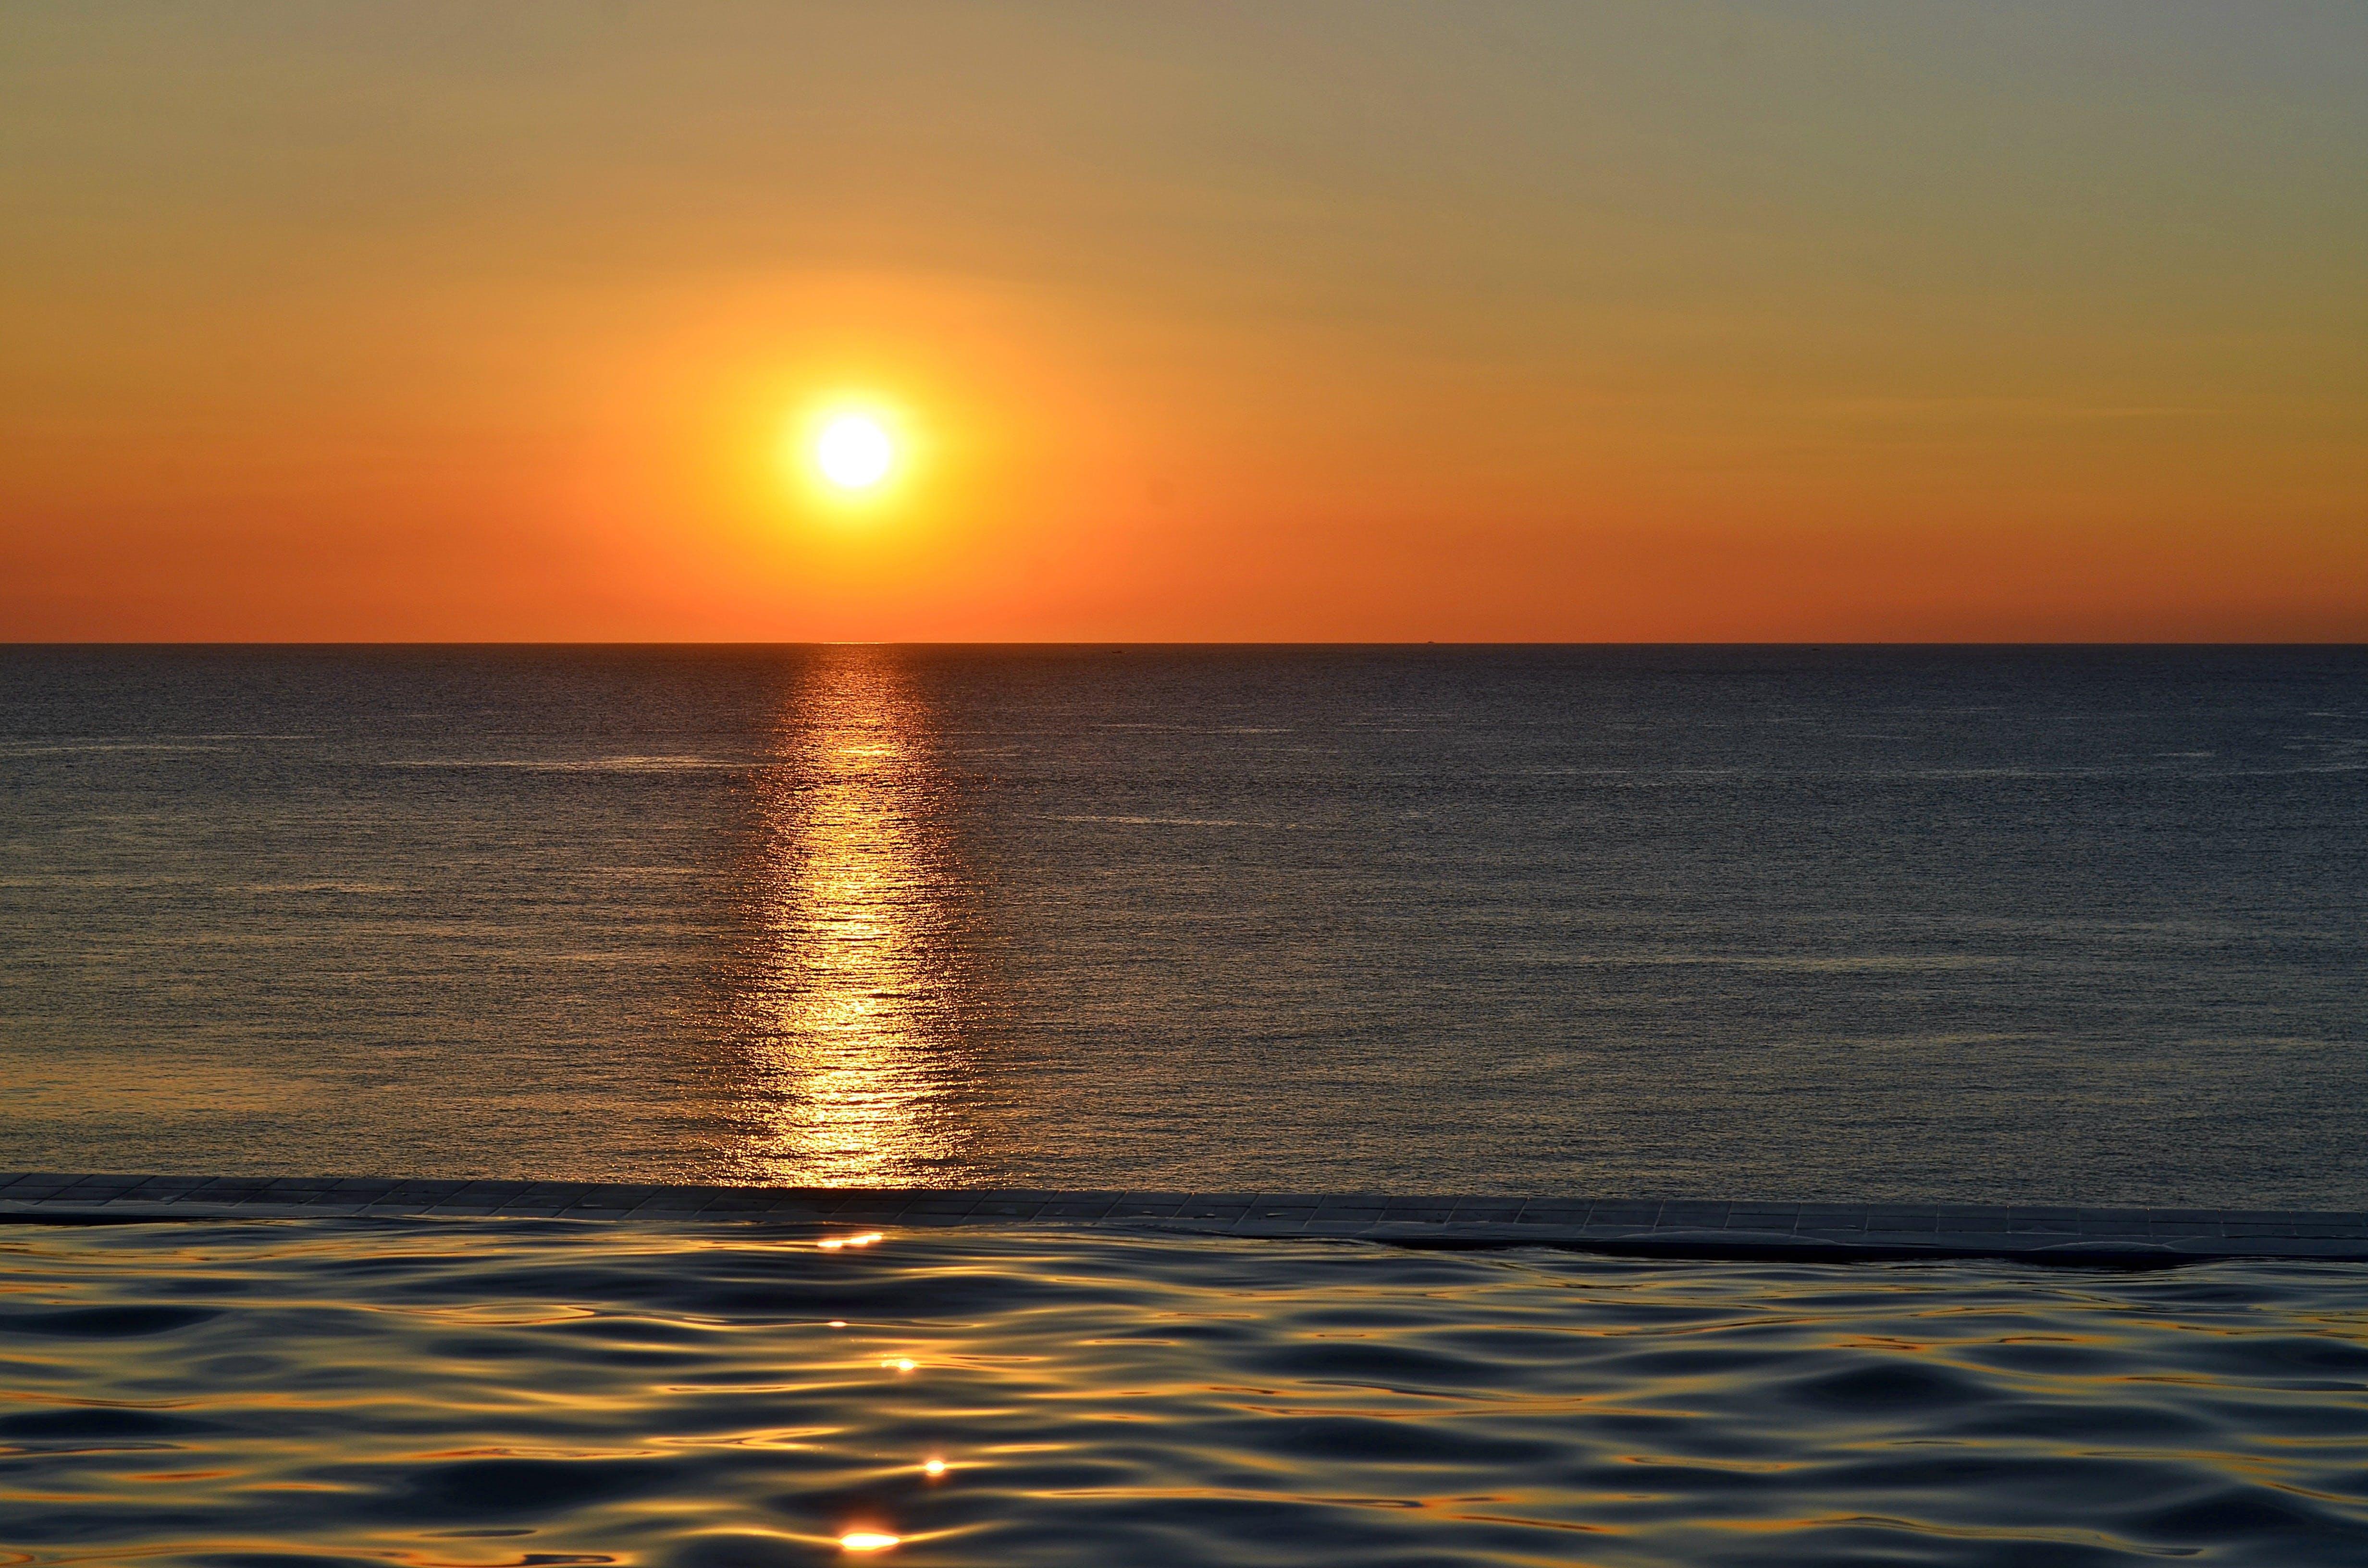 Golden Hour on Beach